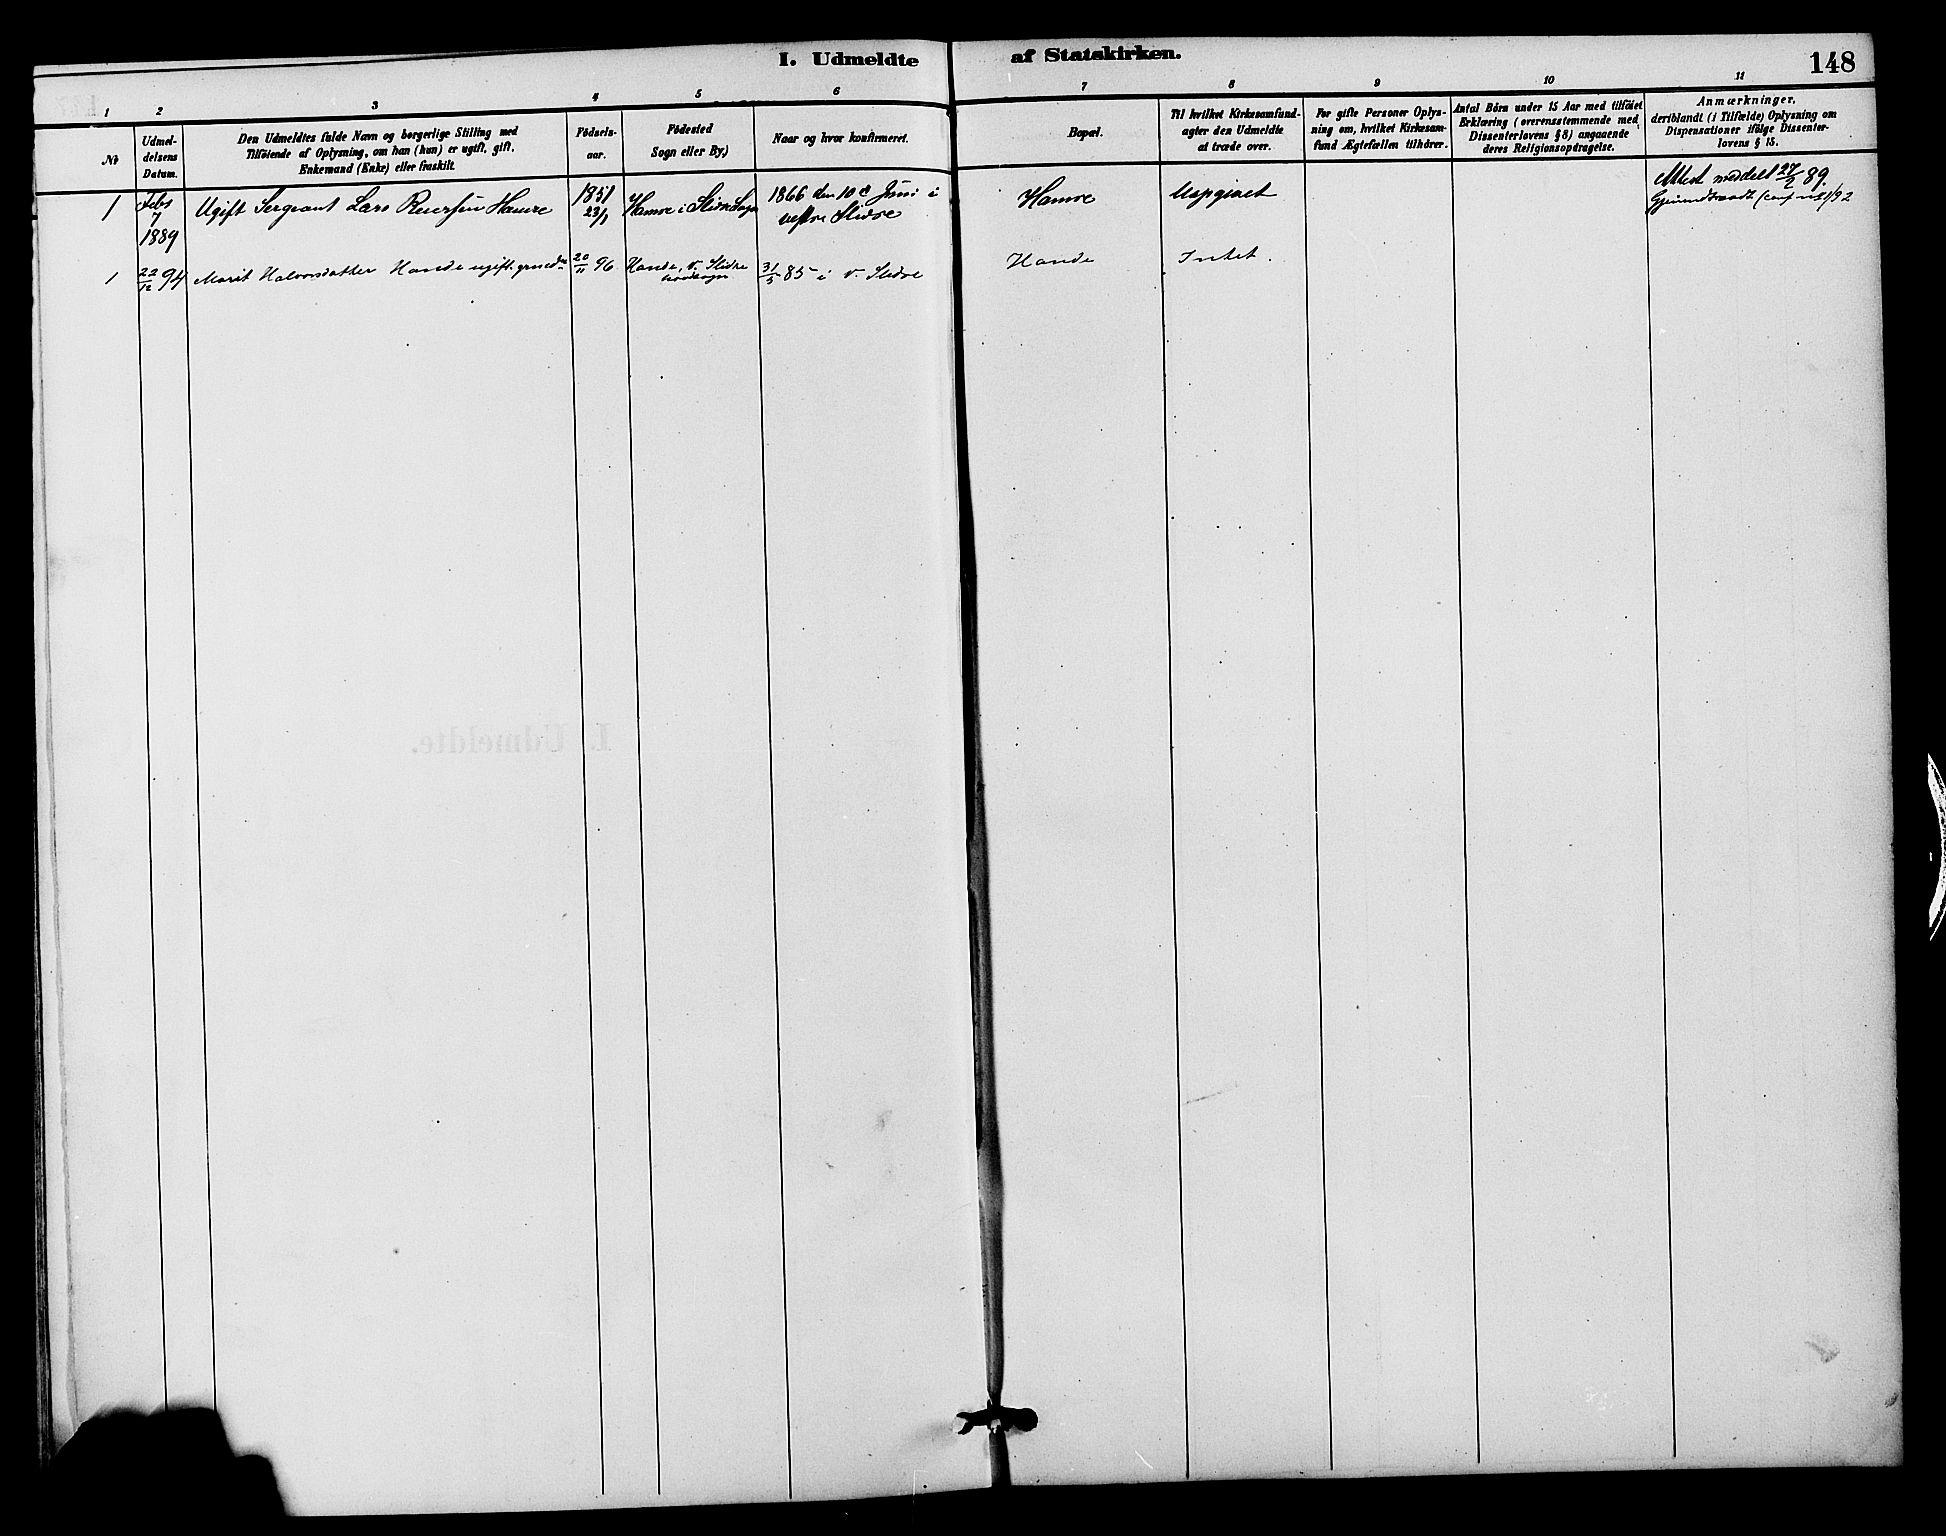 SAH, Vestre Slidre prestekontor, Klokkerbok nr. 4, 1881-1912, s. 148